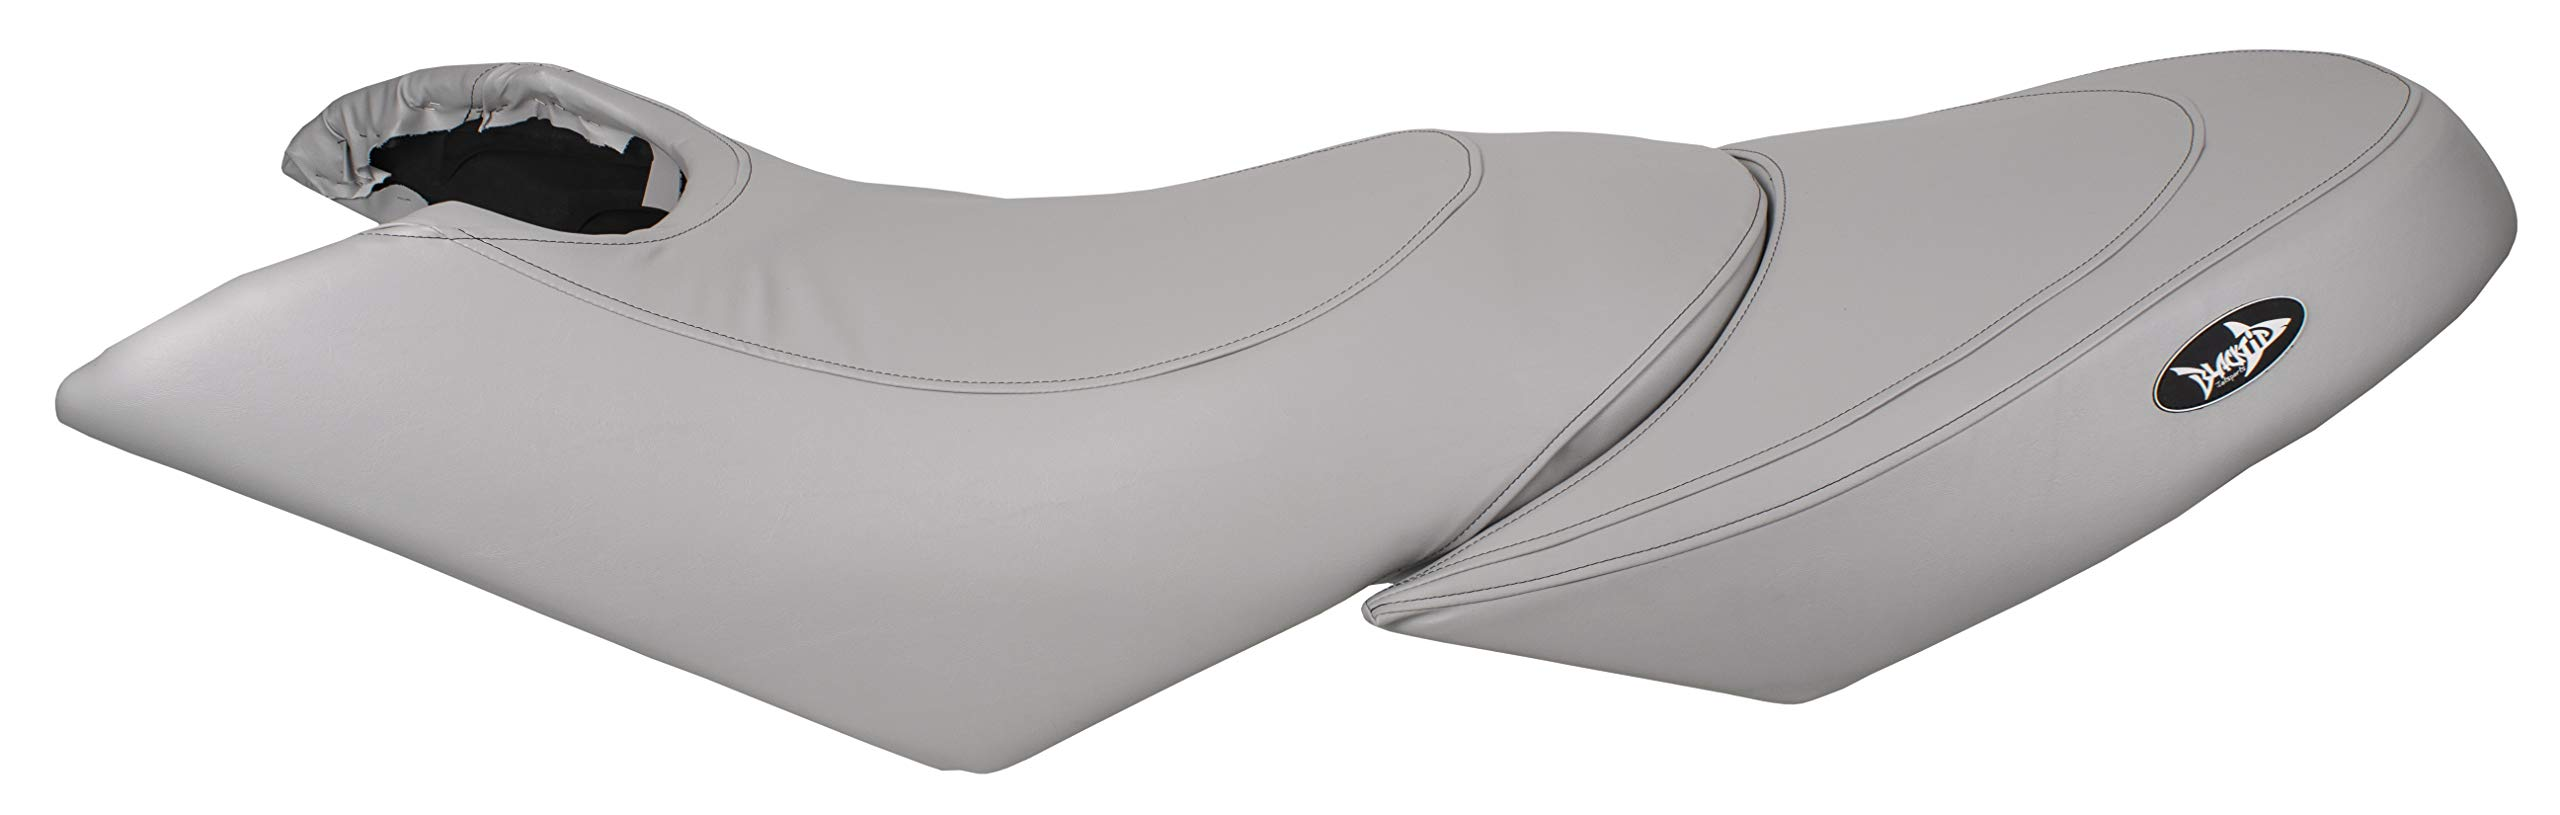 Sea-Doo Seat Cover 02-06 GTX 4-Tec,SC,LTD SC / 05-09 RXT, RXT-X 255/03-08 Wake 155,215/02-03 GTX DI by BlackTip Jetsports